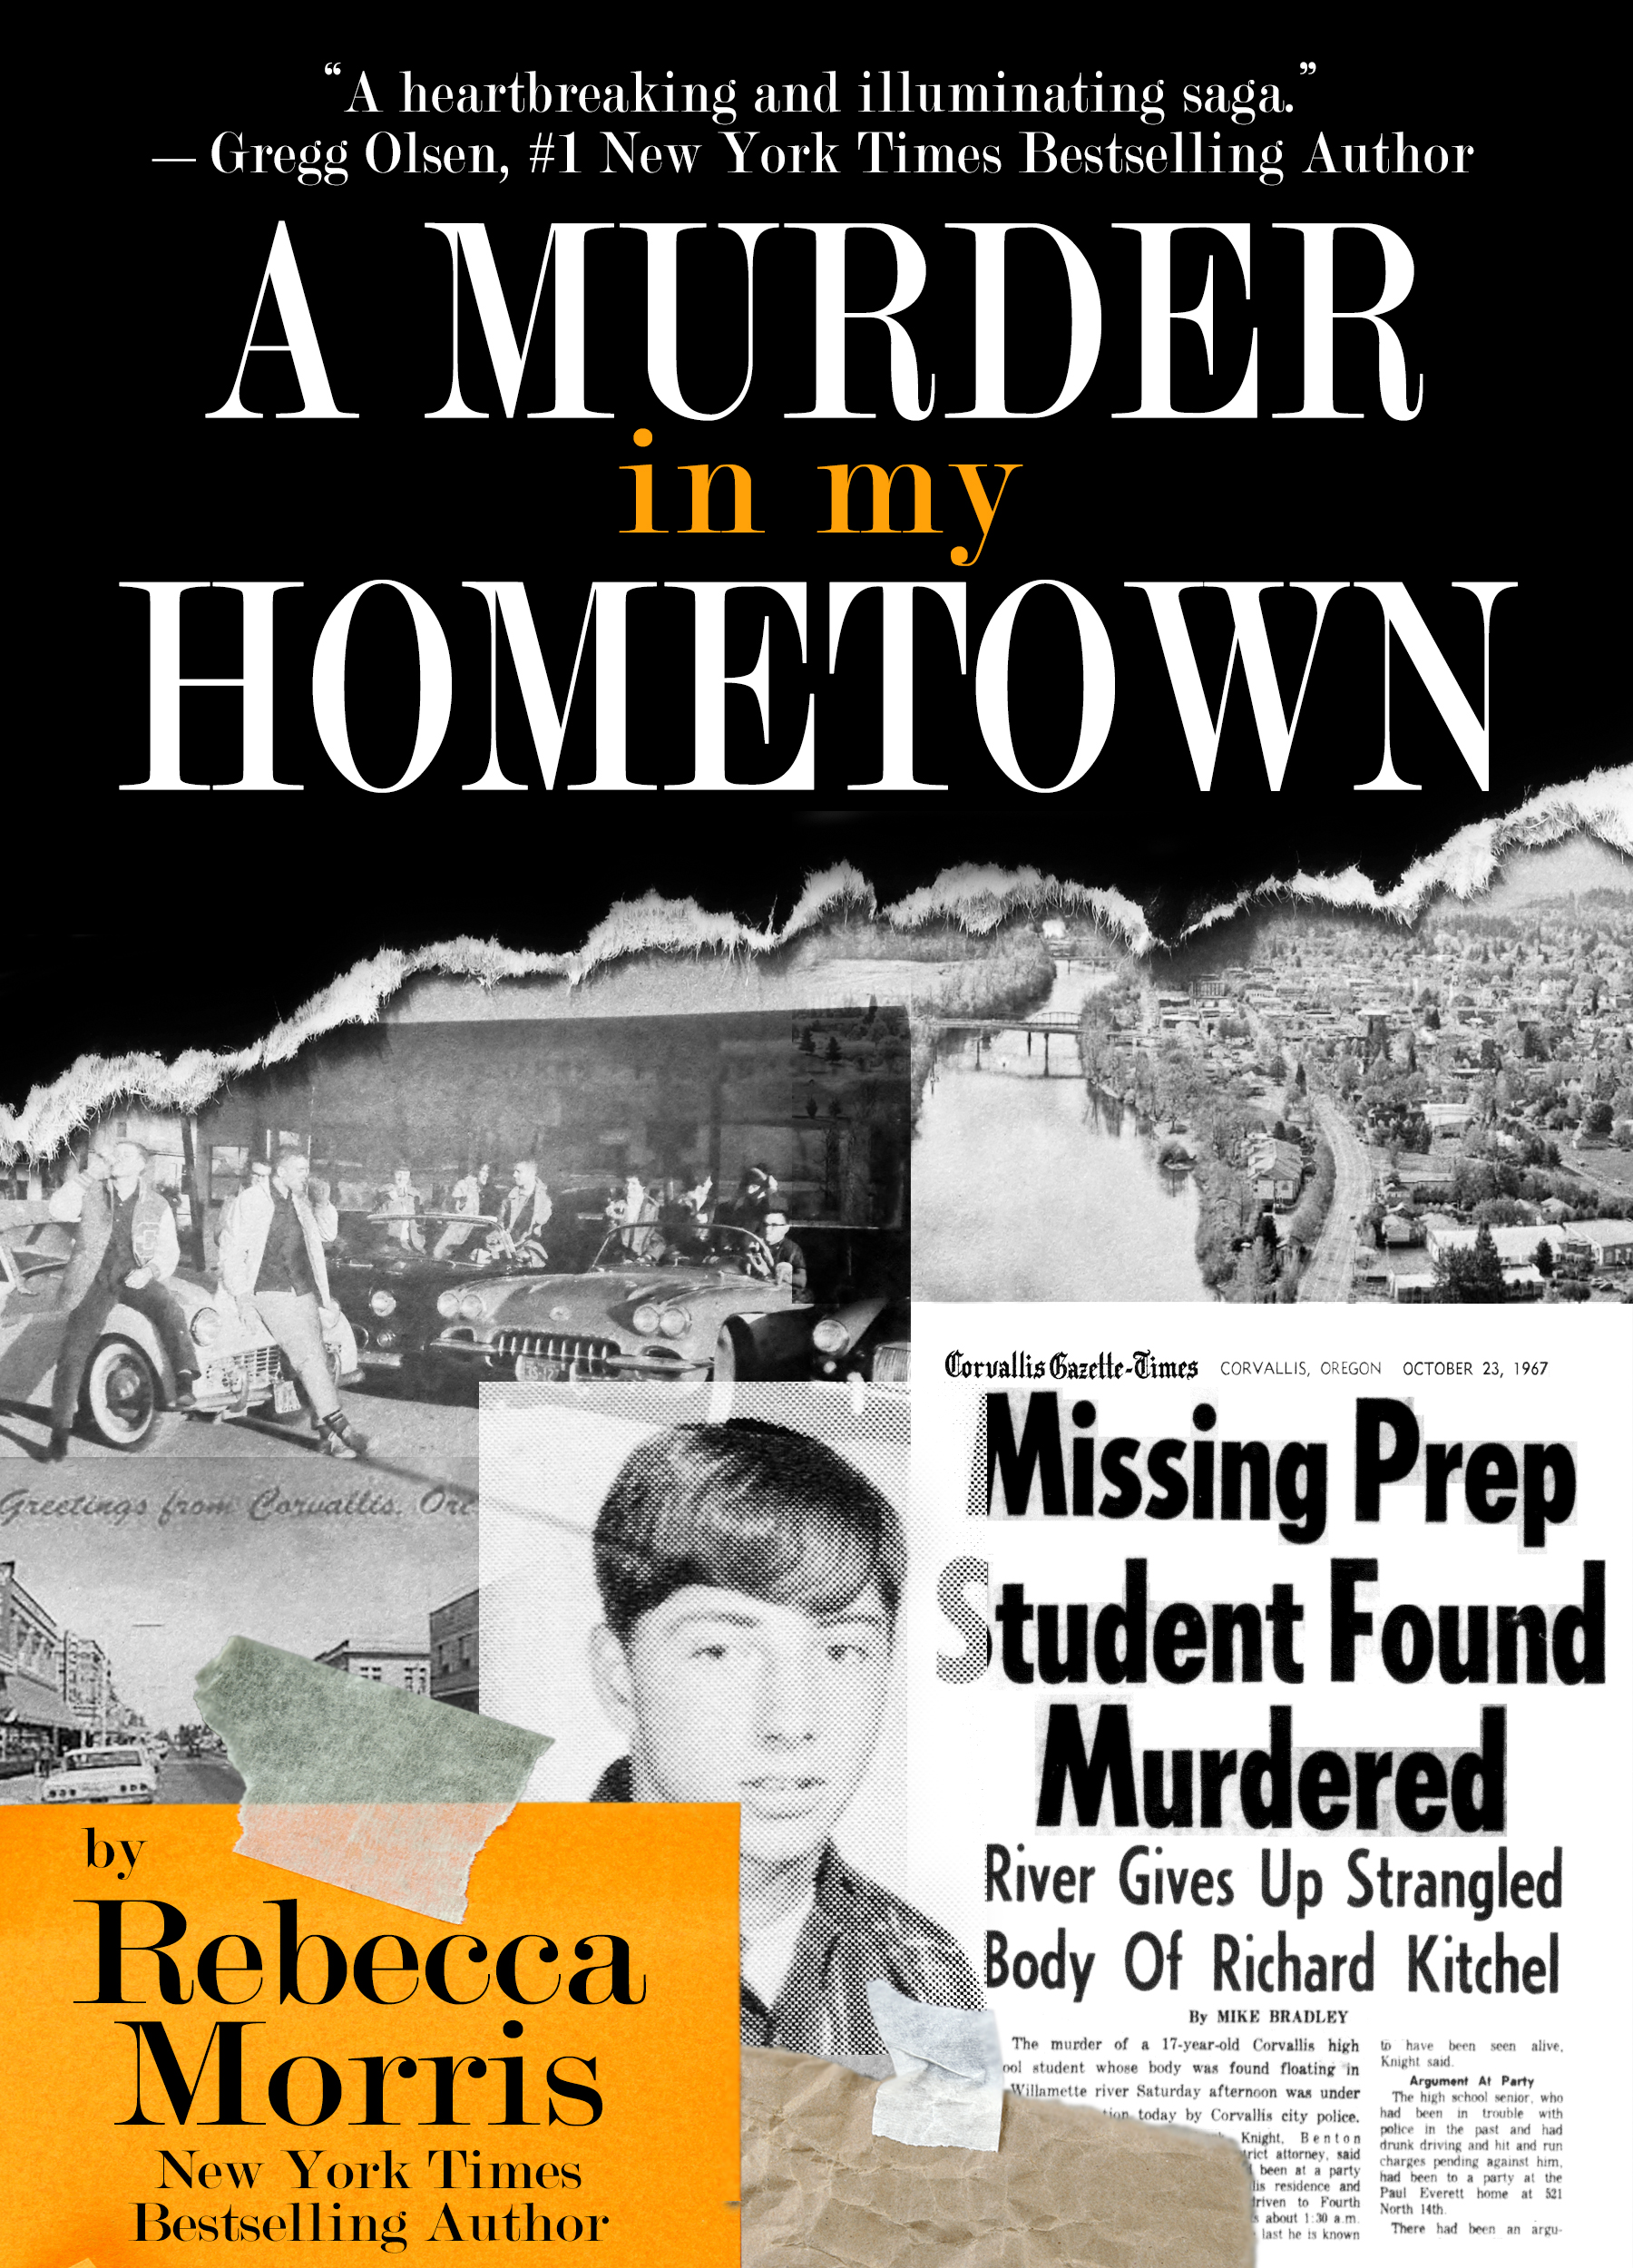 A Murder in my Hometown